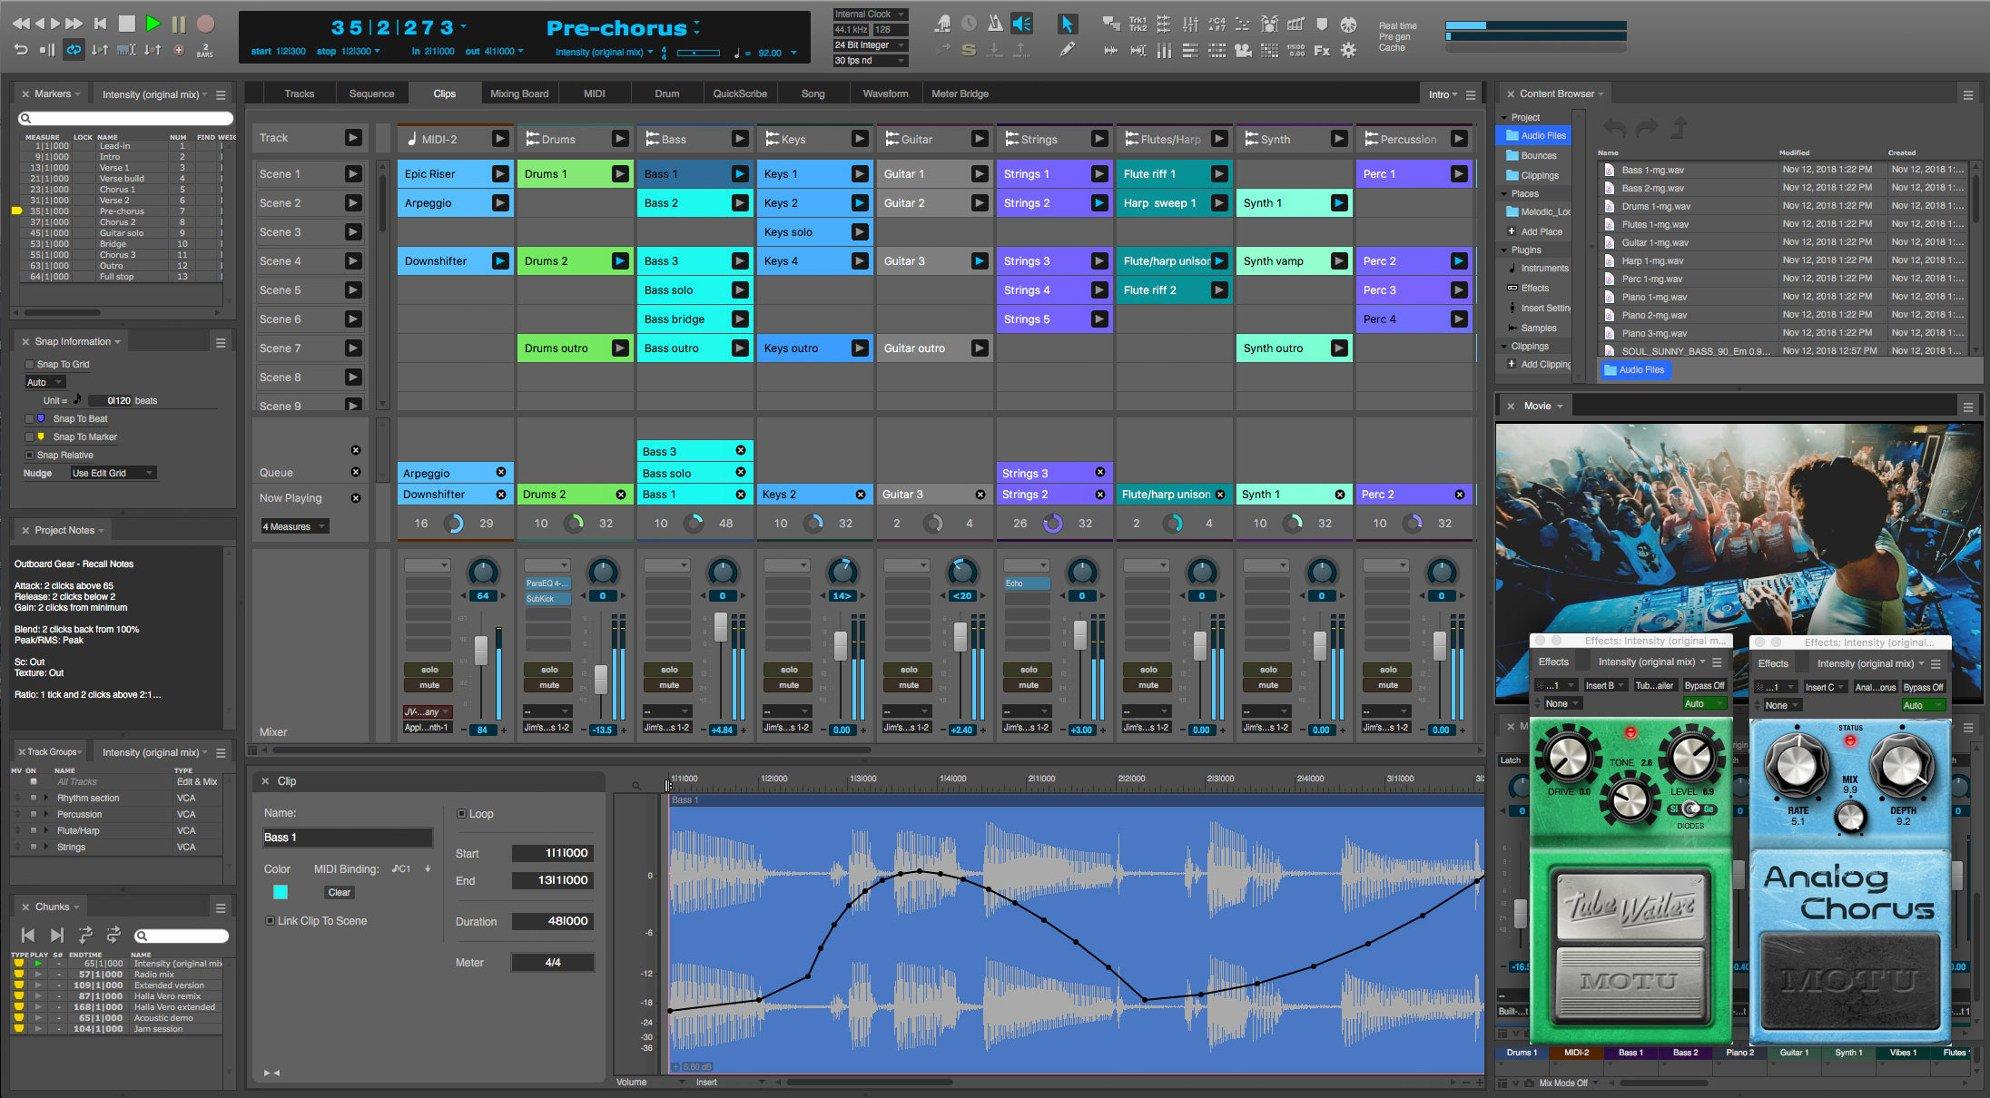 MOTU DIGITAL-PERFORMER-10 Cross Platform DAW And Sequencing